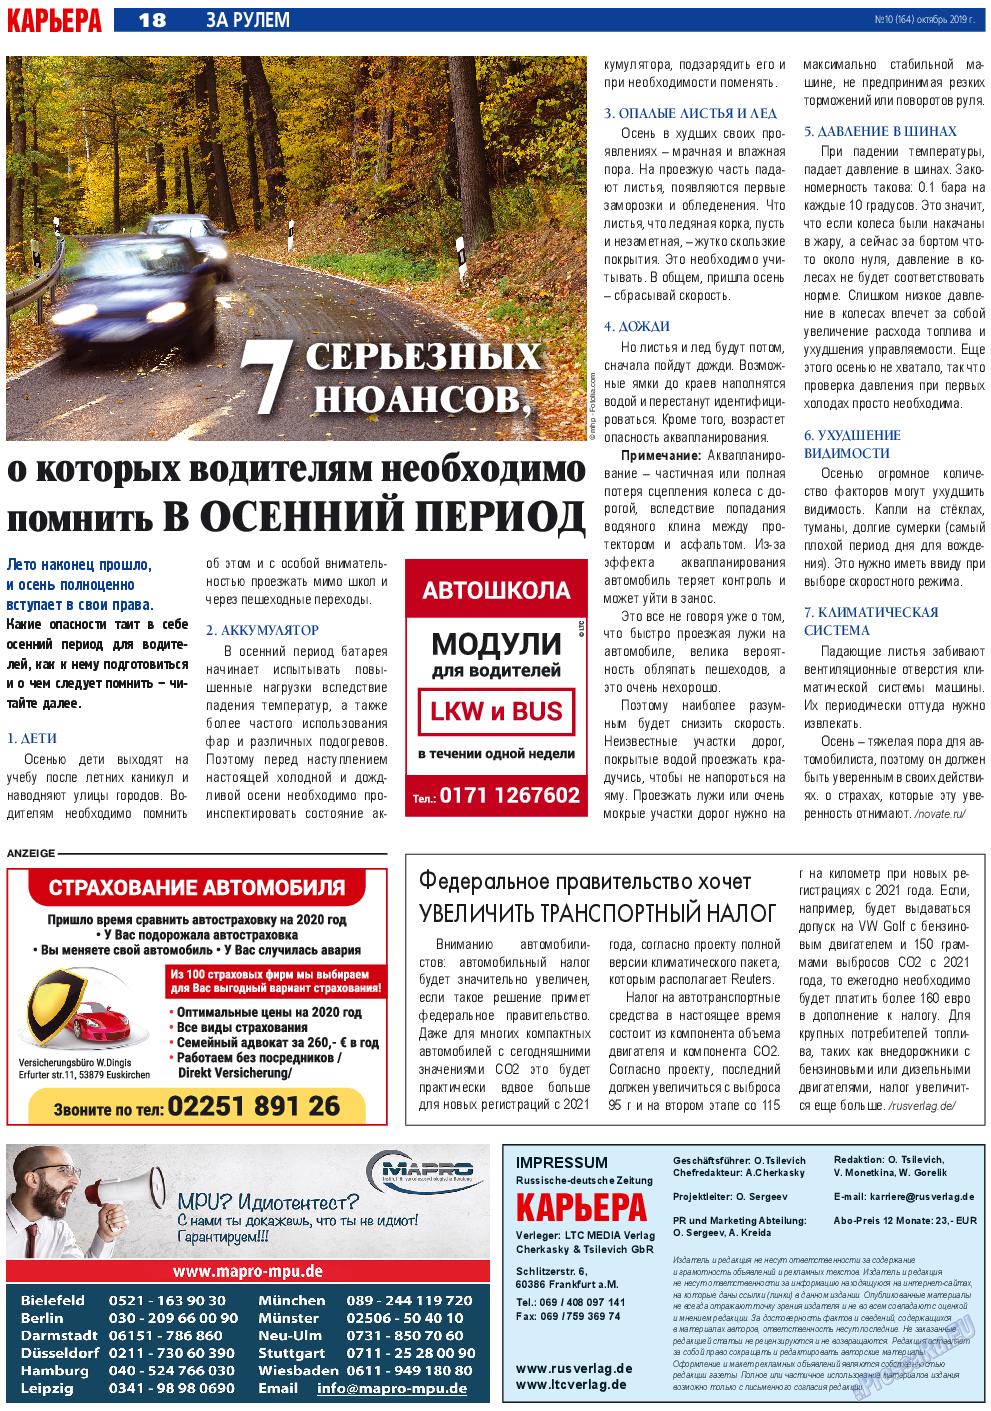 Карьера (газета). 2019 год, номер 10, стр. 18